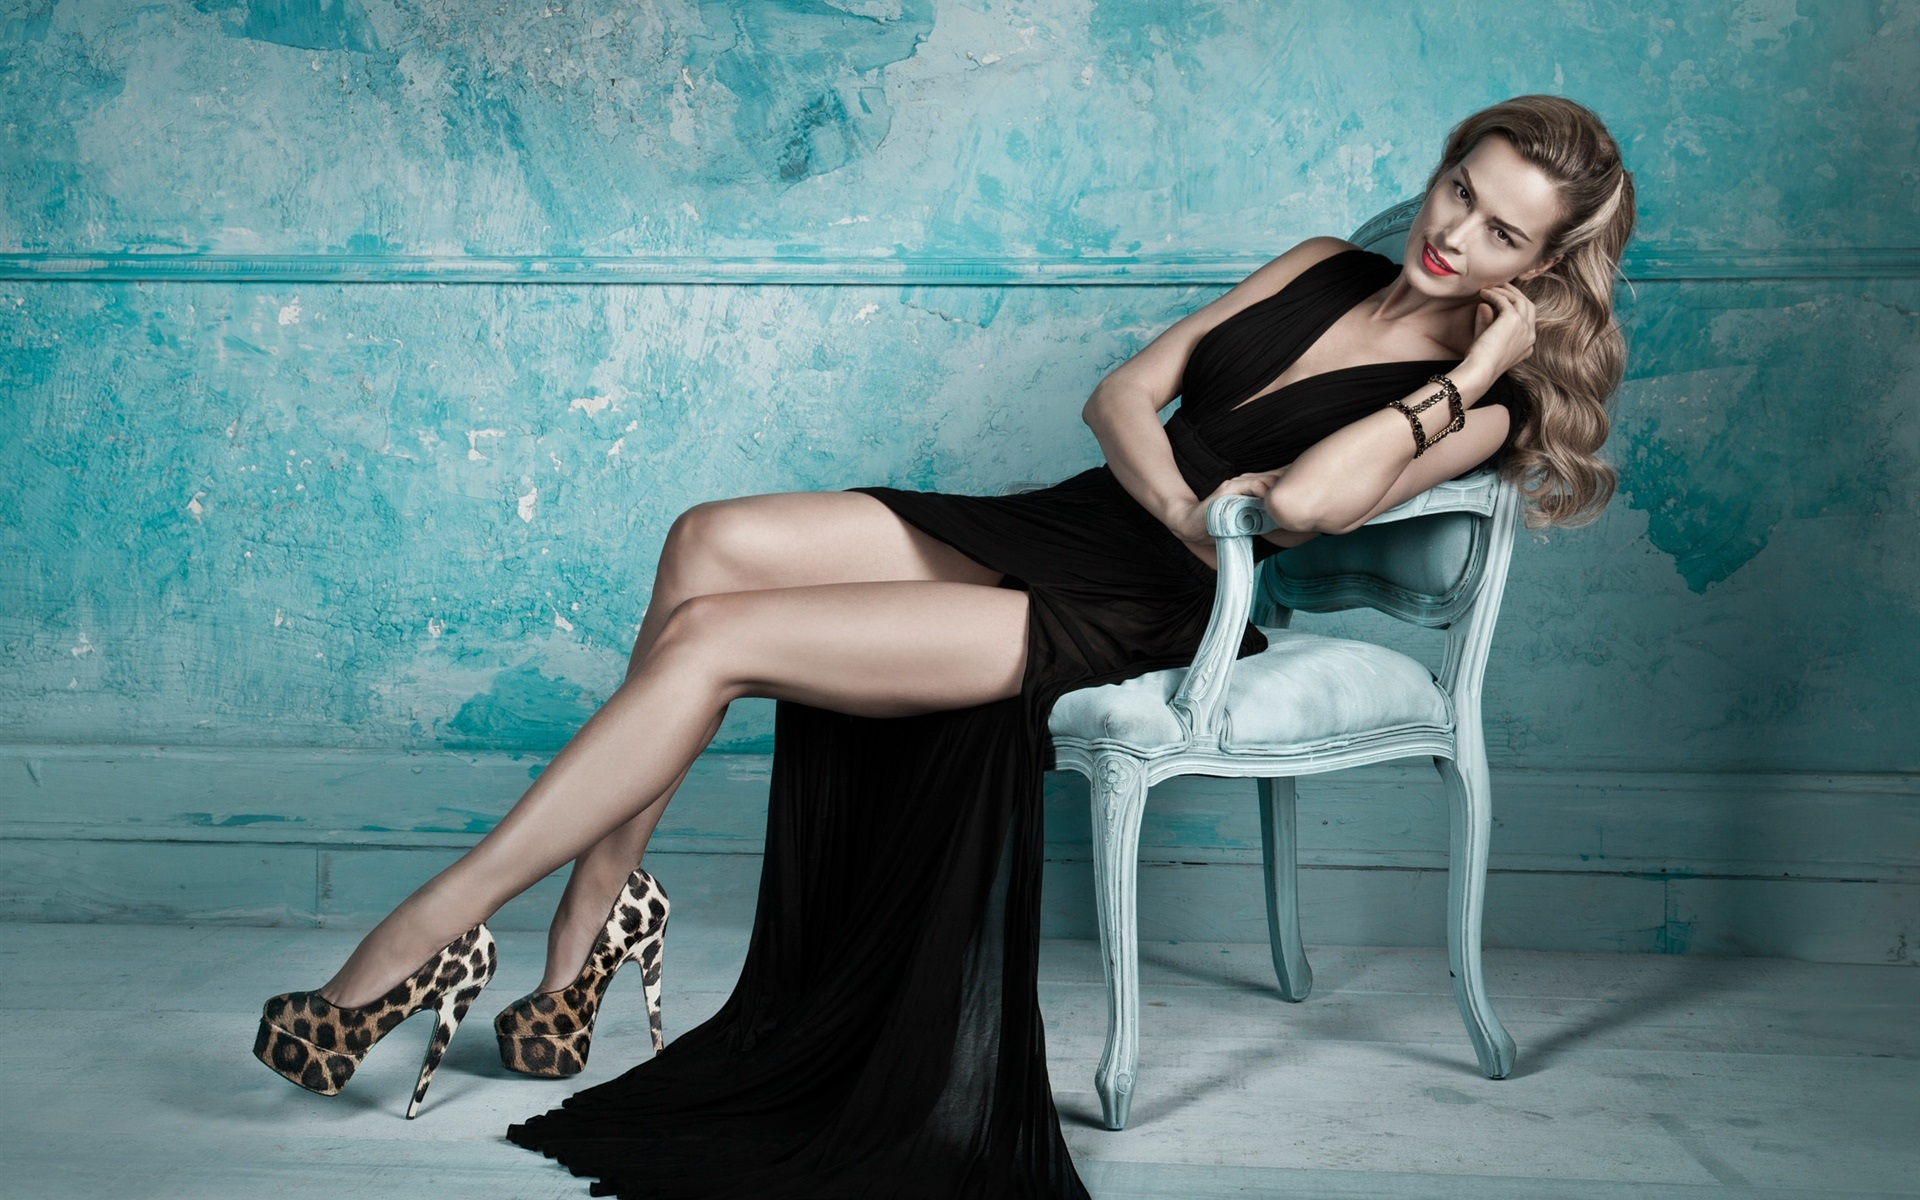 3d Kickboxing Wallpaper Blonde Girl Black Dress Legs Posture Chair Wallpaper